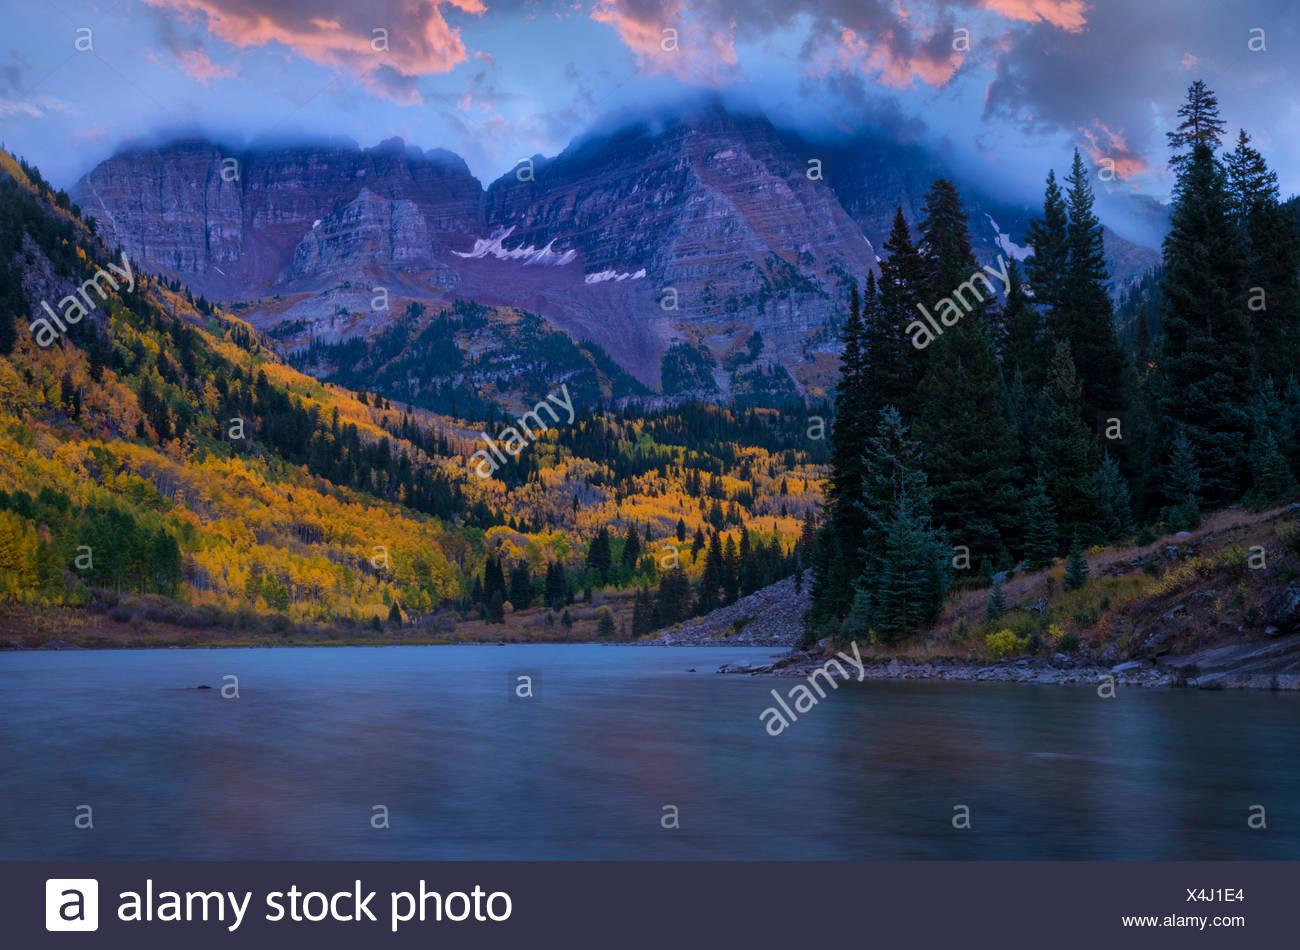 Colorado, Rockies, Aspen, Maroon lakes in autumn (m) - Stock Image